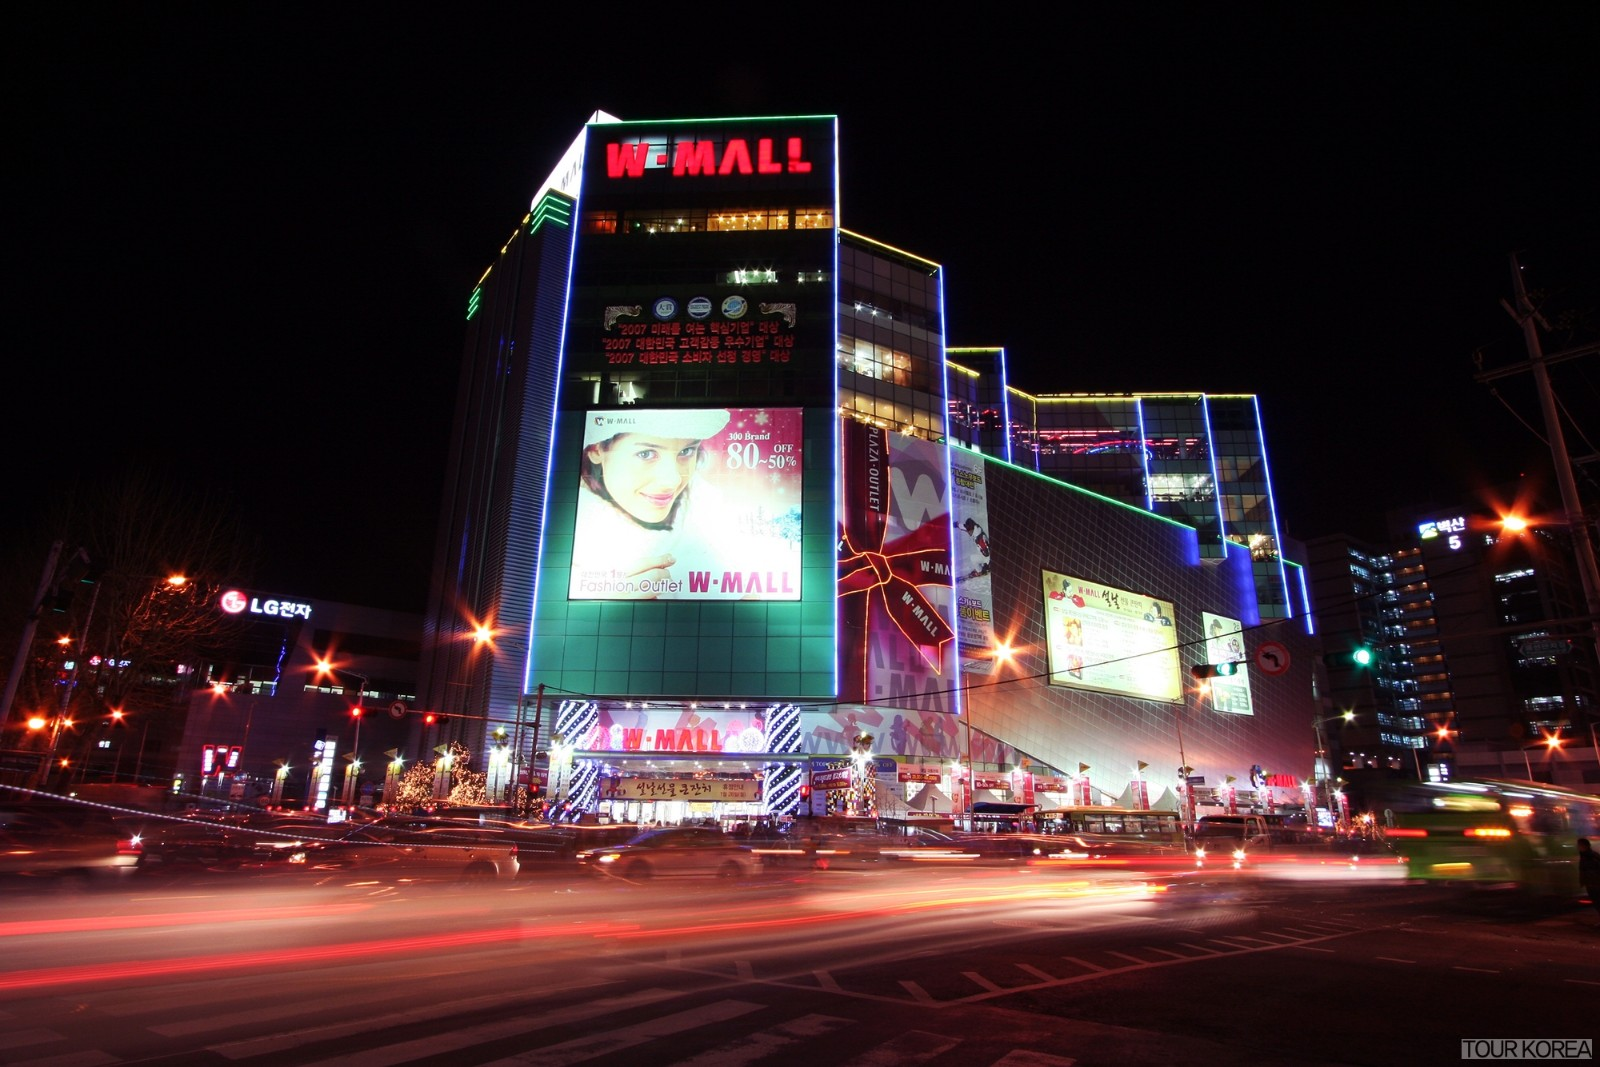 w-mall.jpg